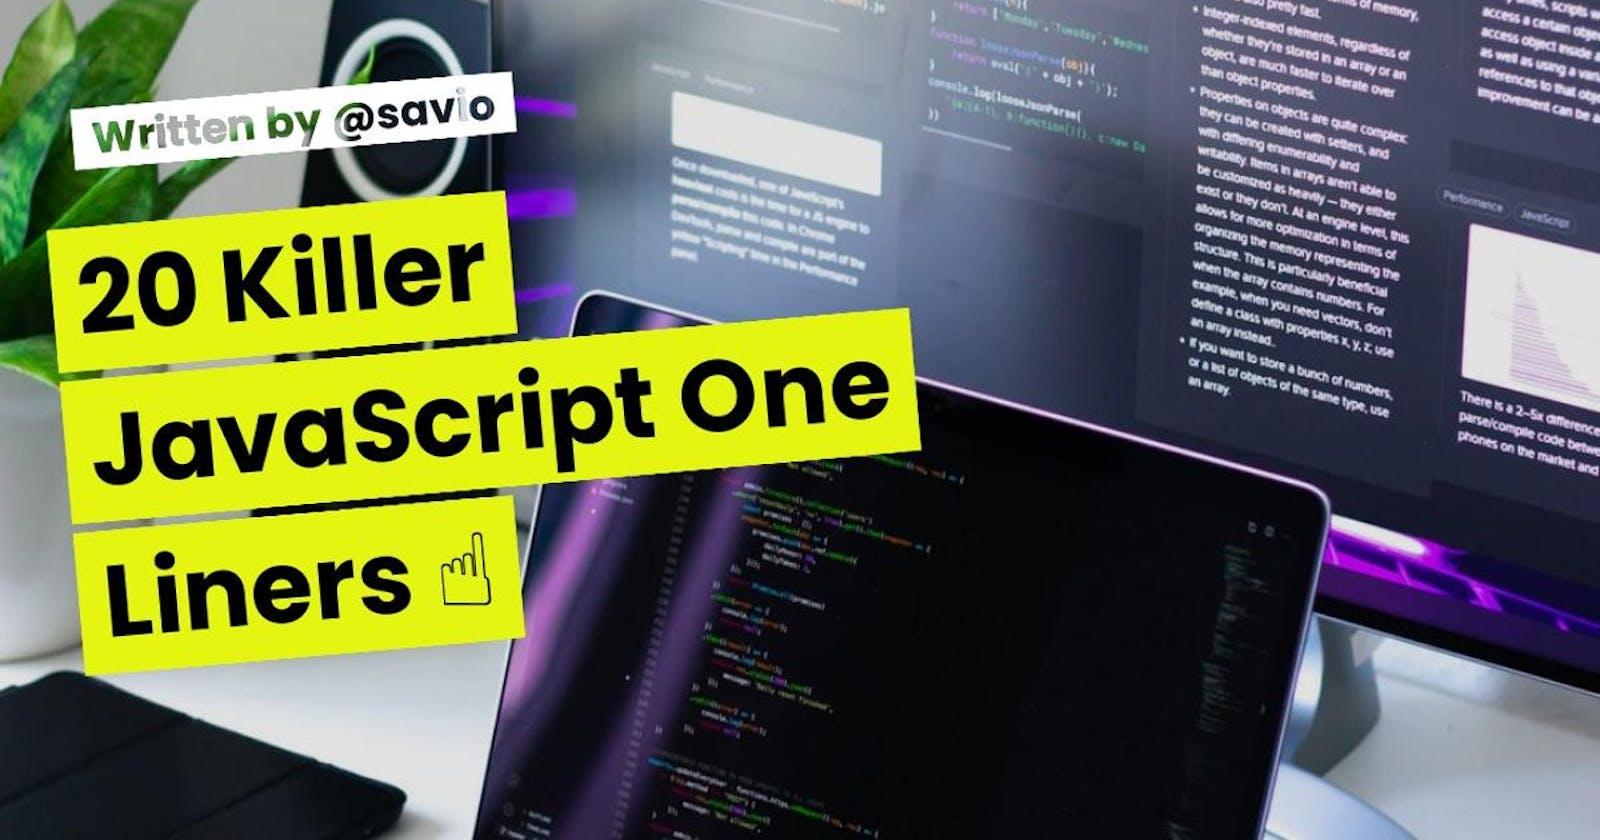 20 Killer JavaScript One Liners ☝️